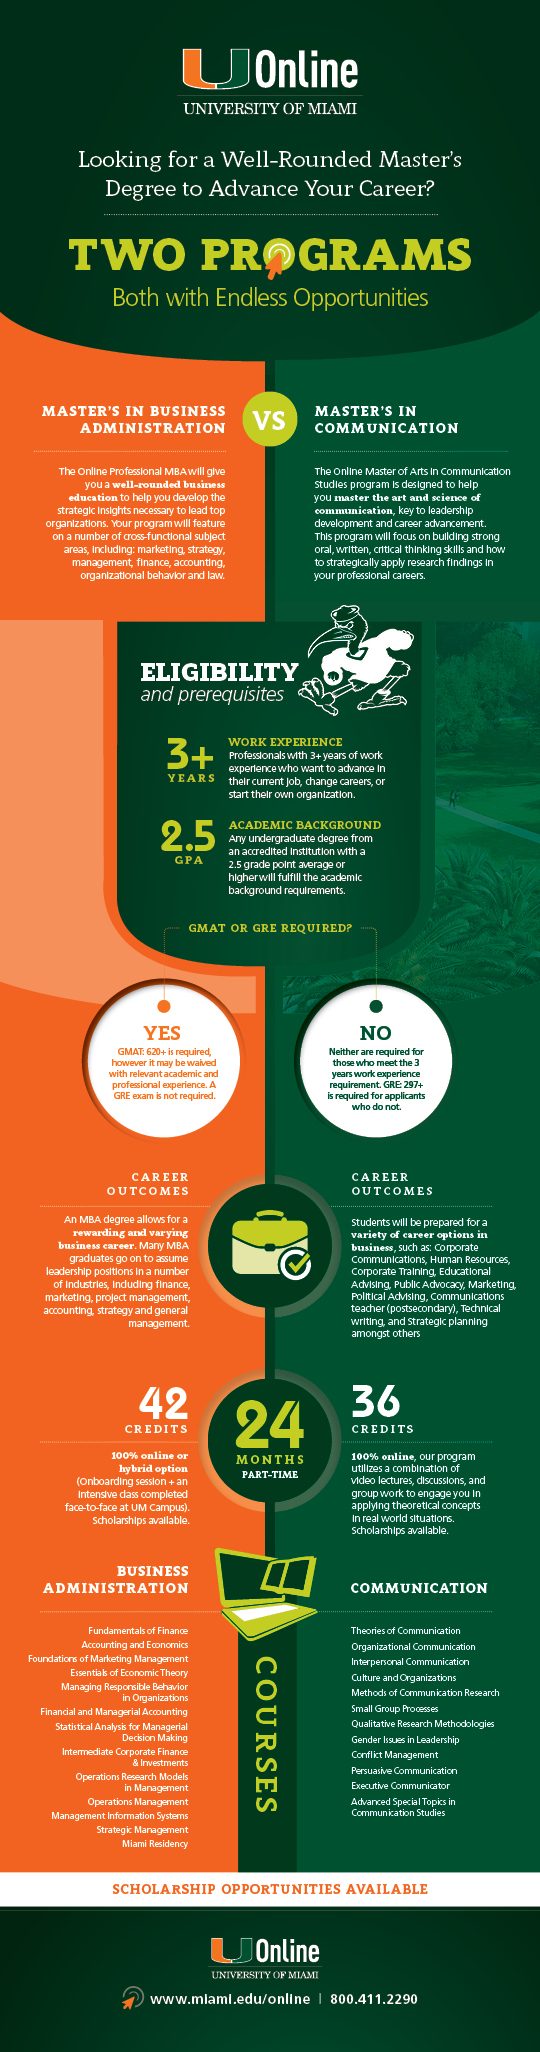 UoM_MBAvsMA_Infographic.jpg